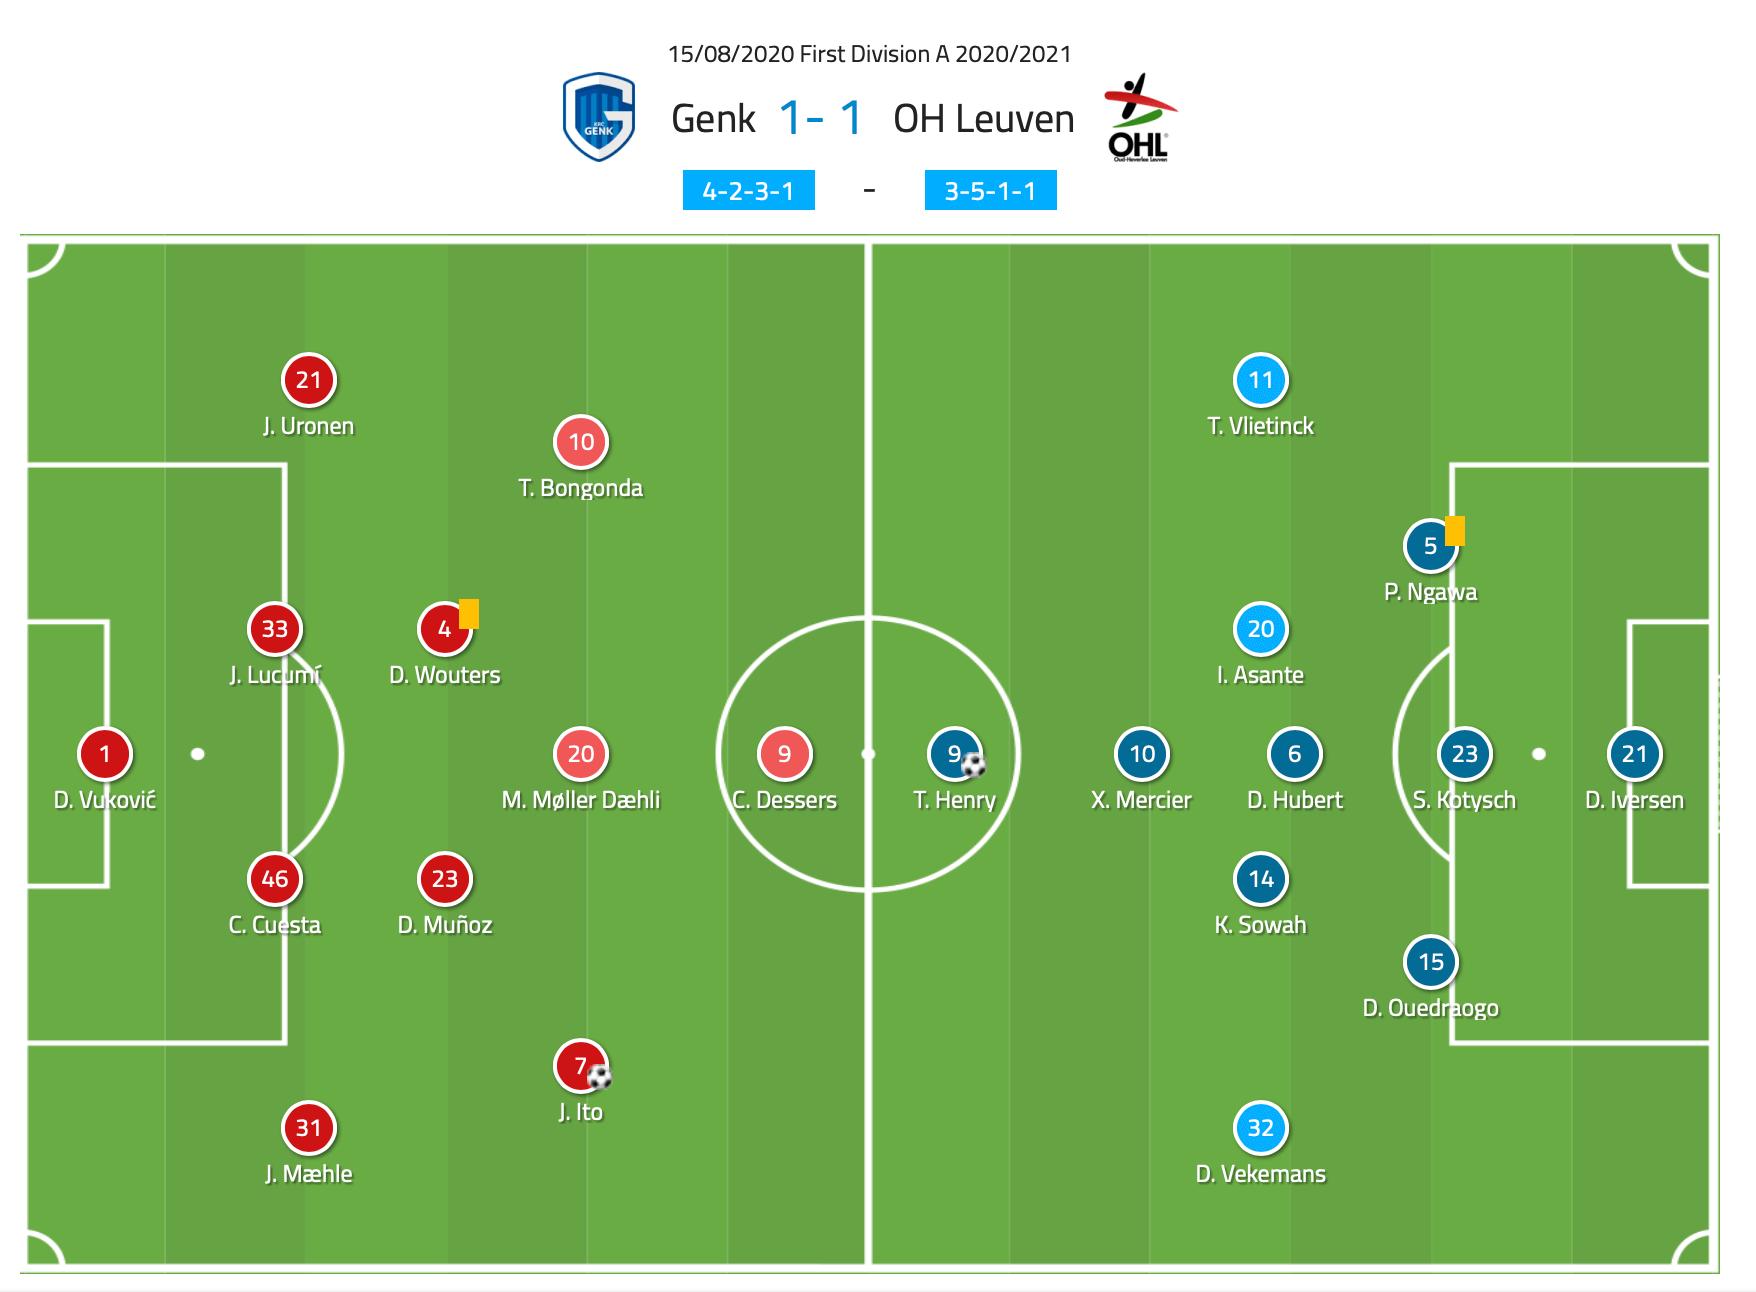 Belgian First Division A 2020/21: Genk vs OH Leuven - tactical analysis tactics